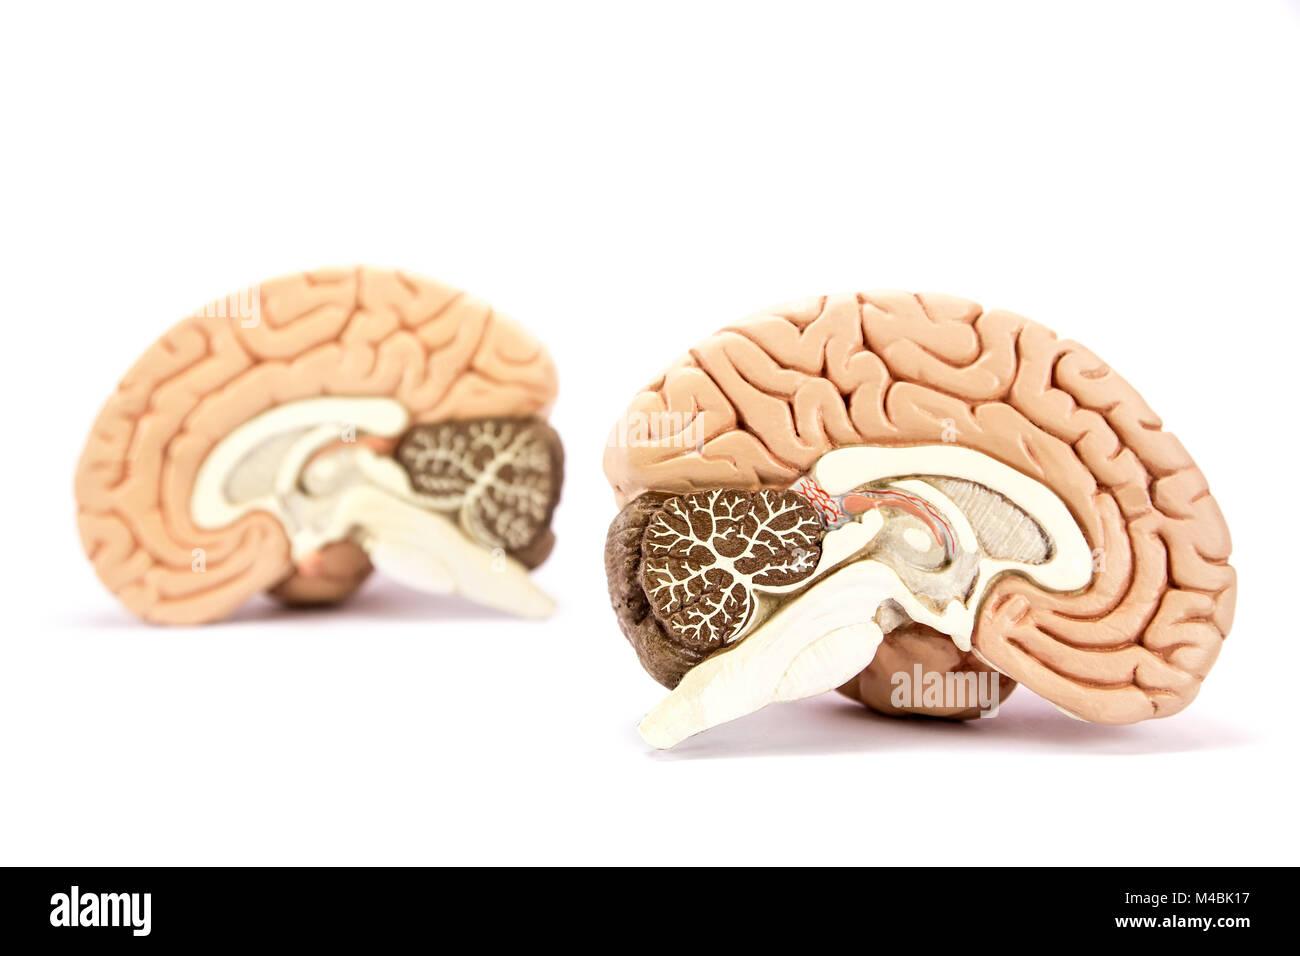 Human brains model isolated on white background - Stock Image